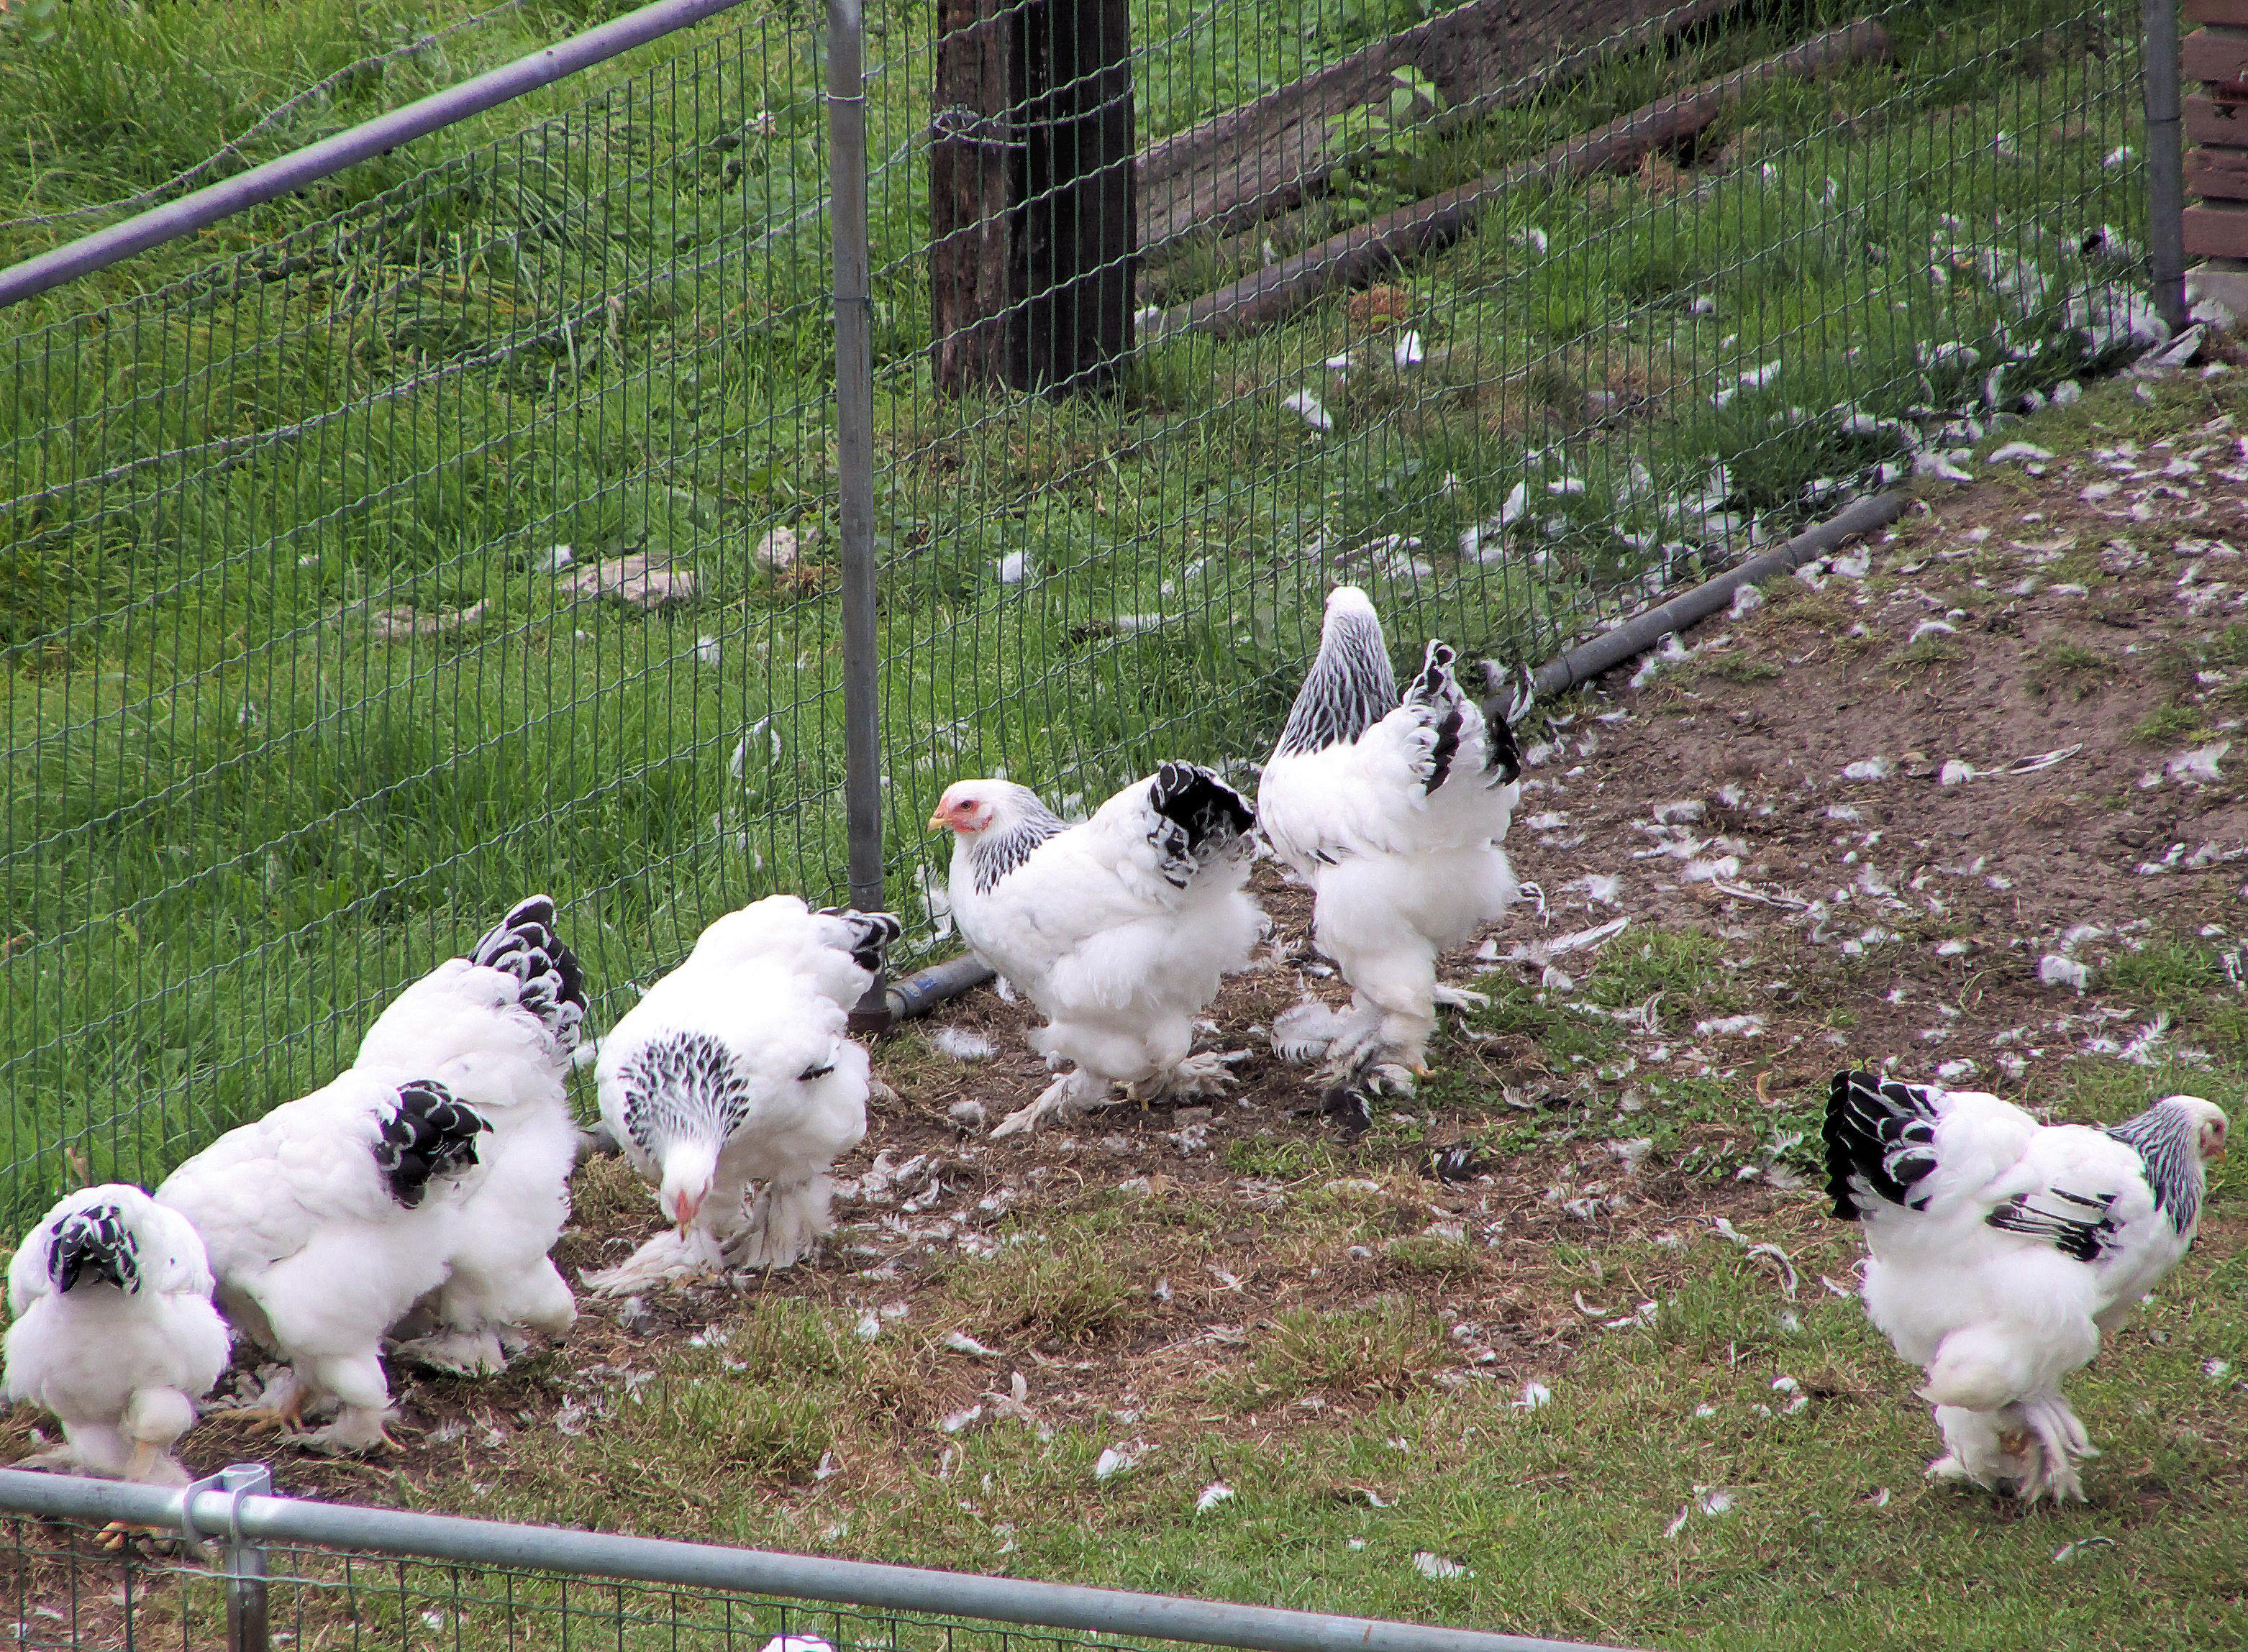 File:Brahma kippen, witcolumbia zwart getekend.jpg - Wikimedia Commons